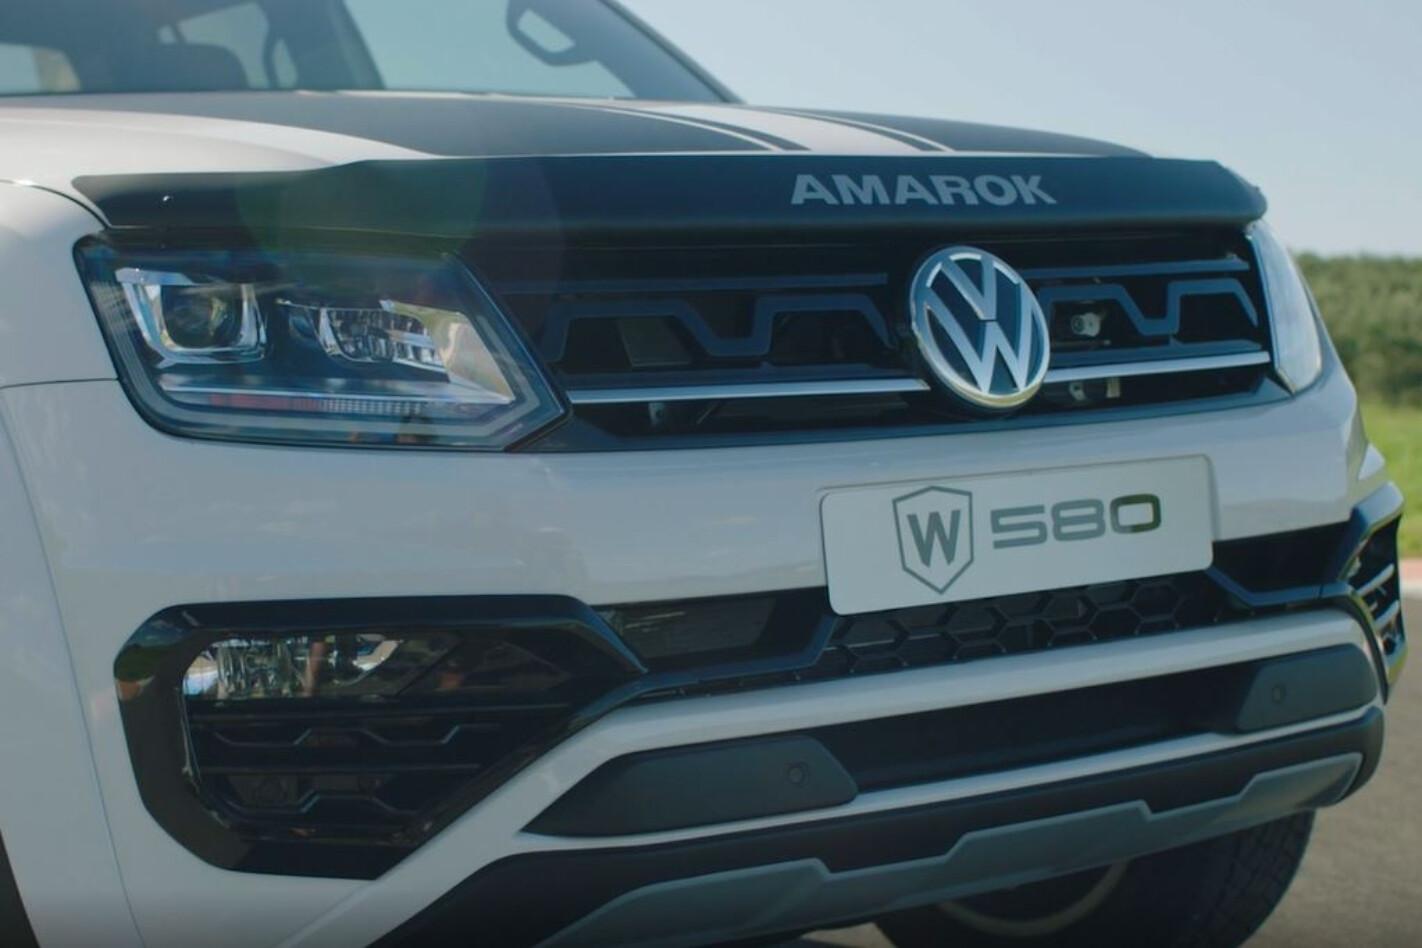 Volkswagen Amarok W580 Walkinshaw